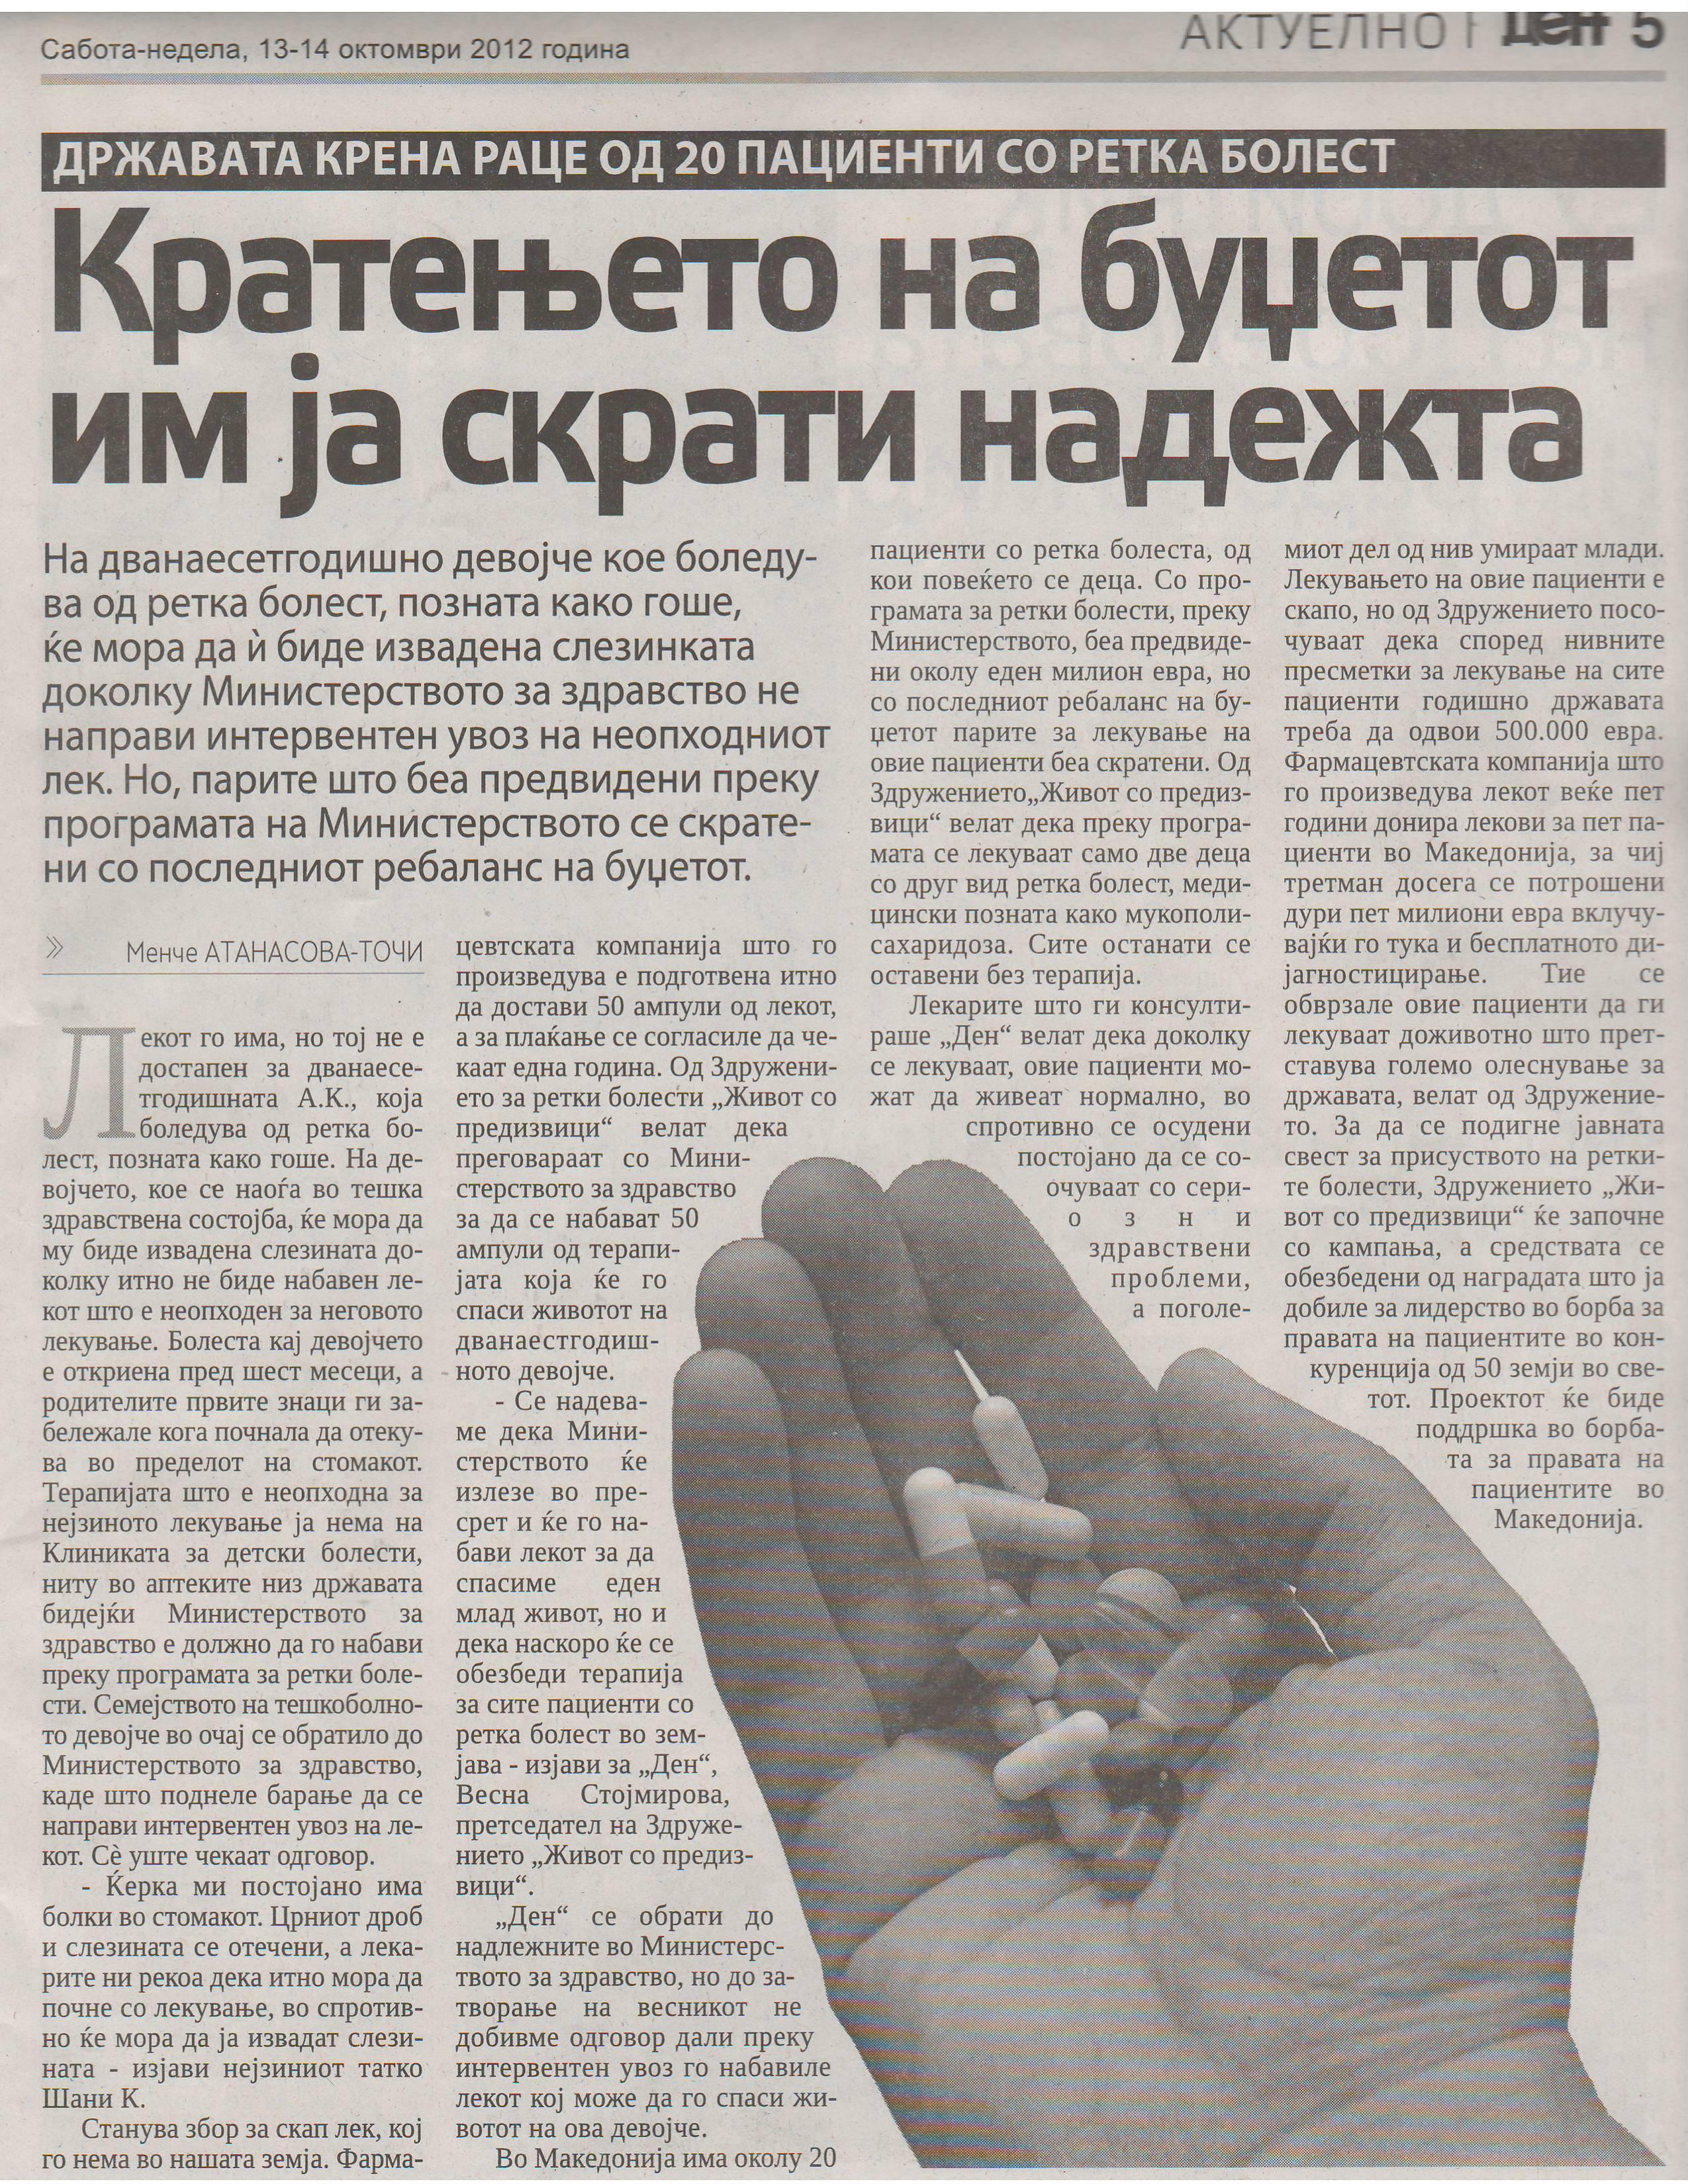 Den - daily national newspaper - rare diseases in Macedonia